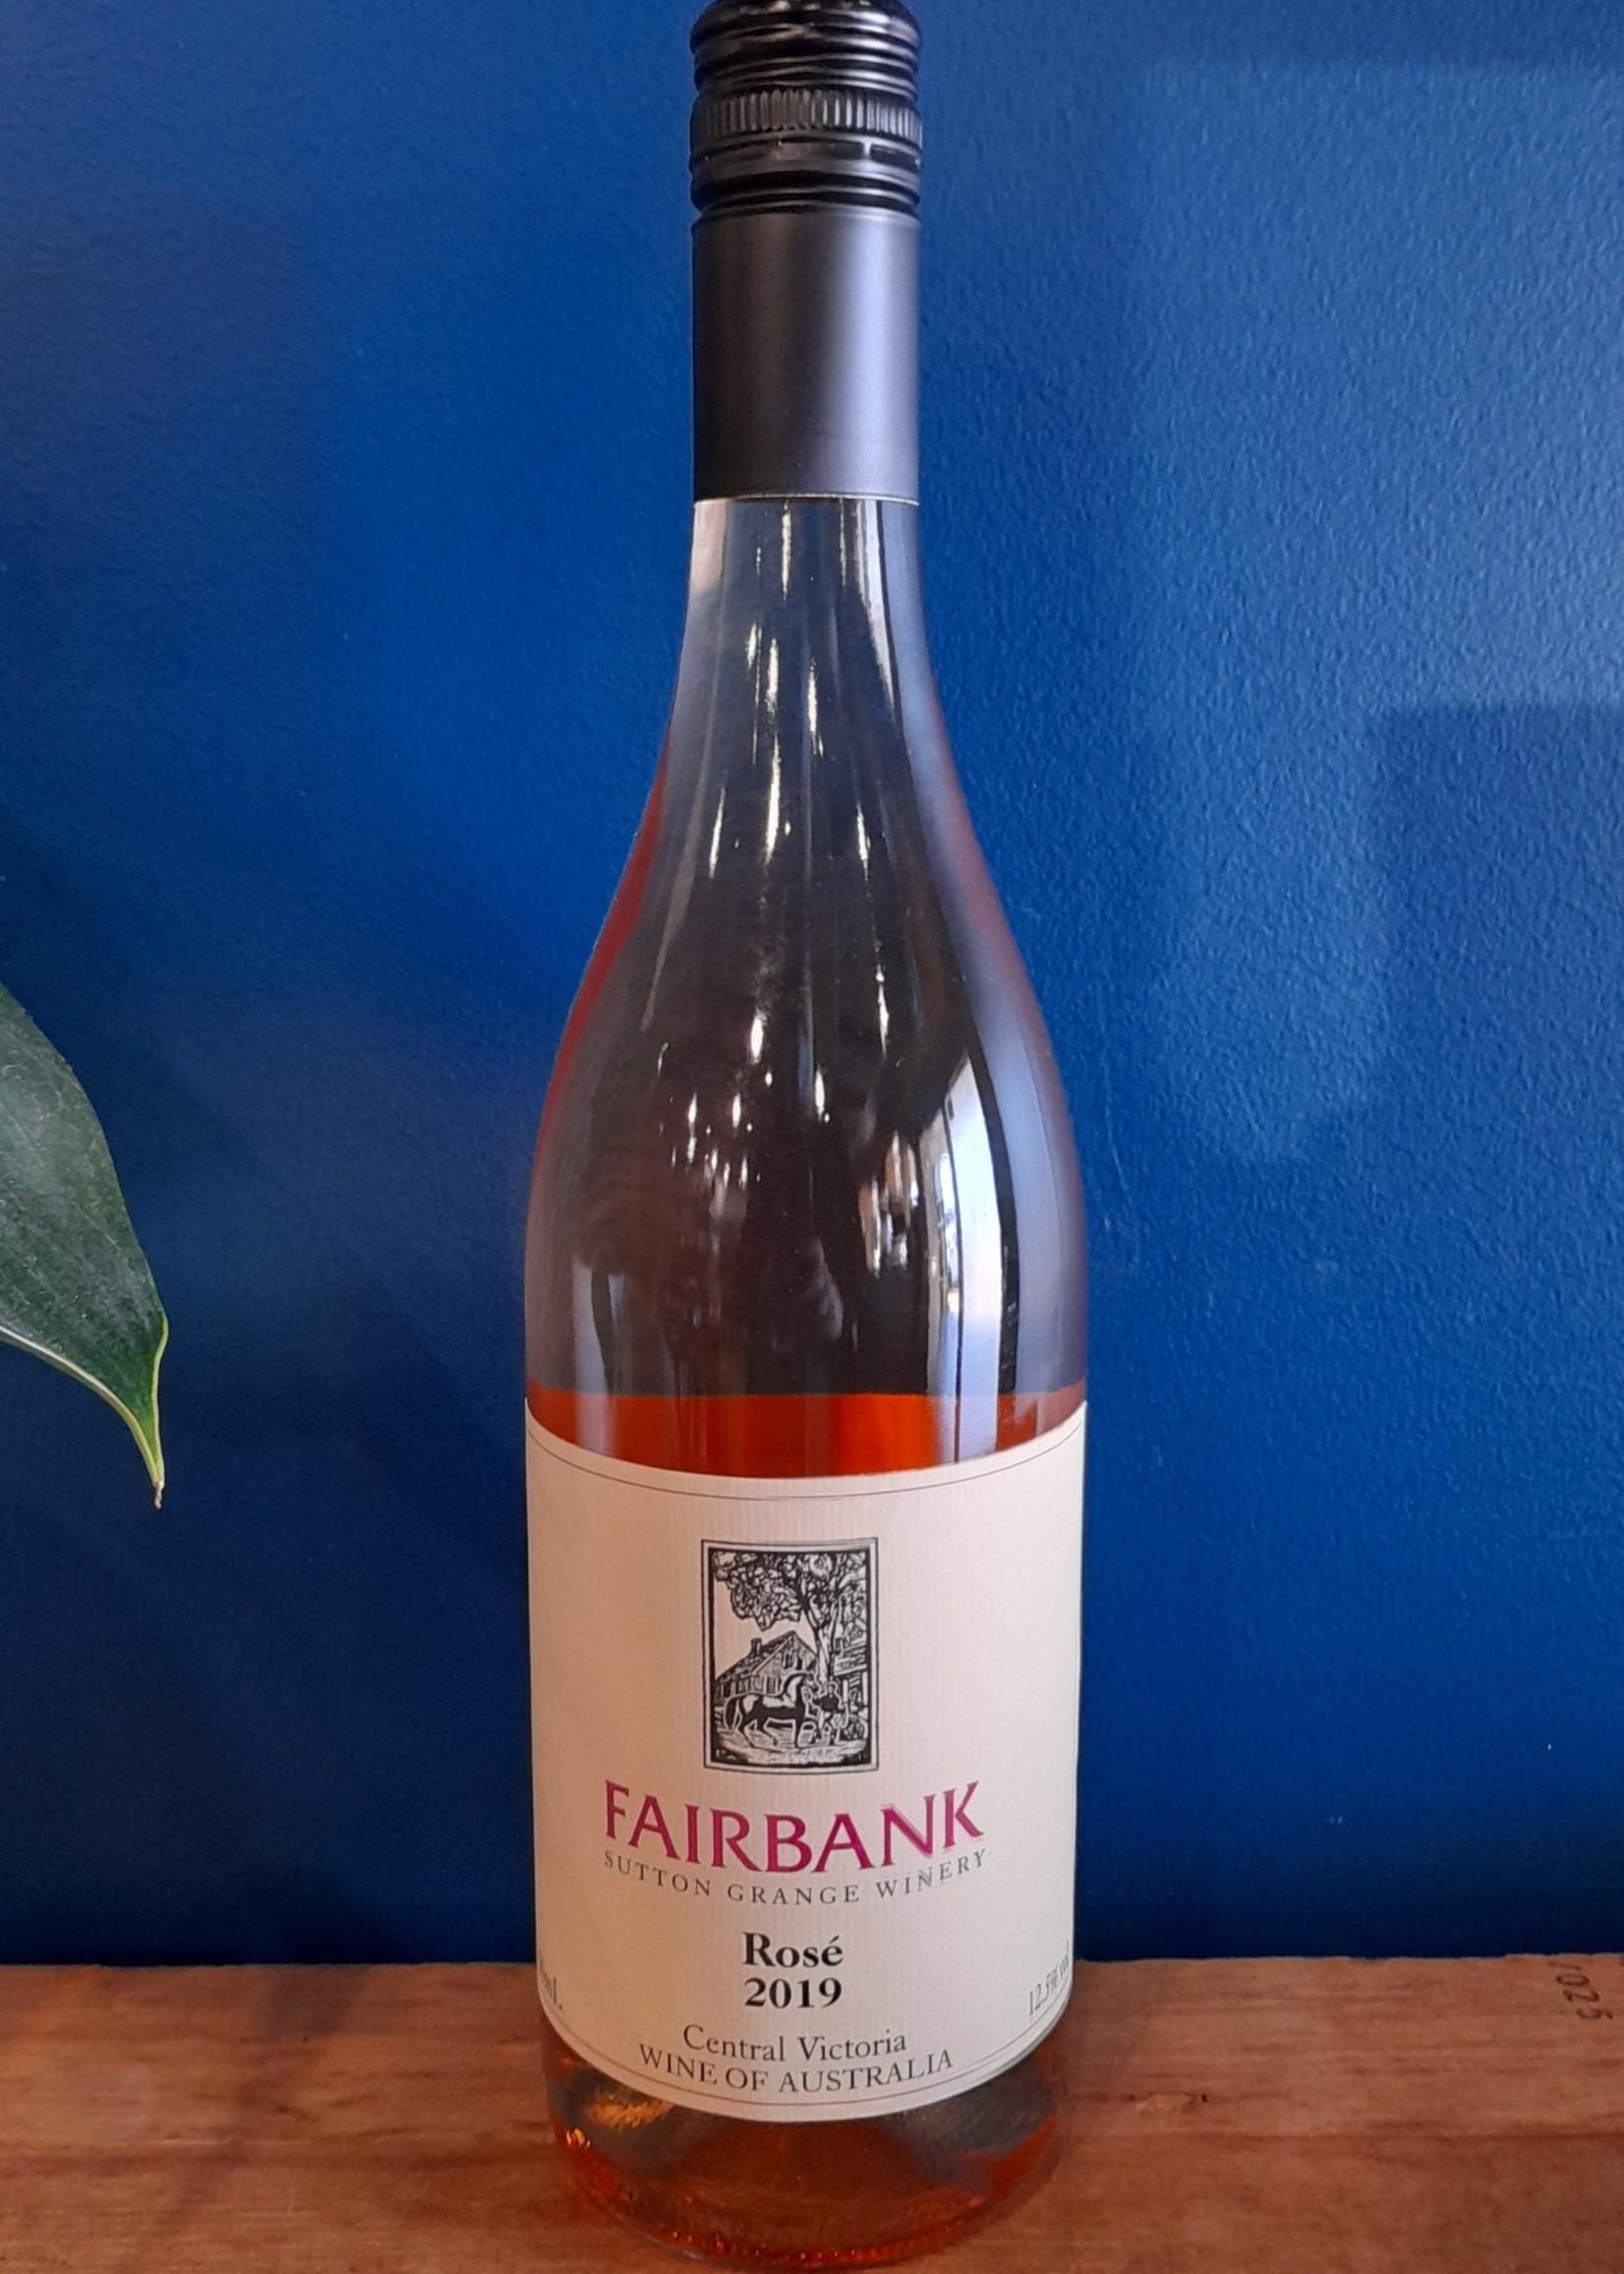 Sutton Grange Winery Fairbank Rose 2019